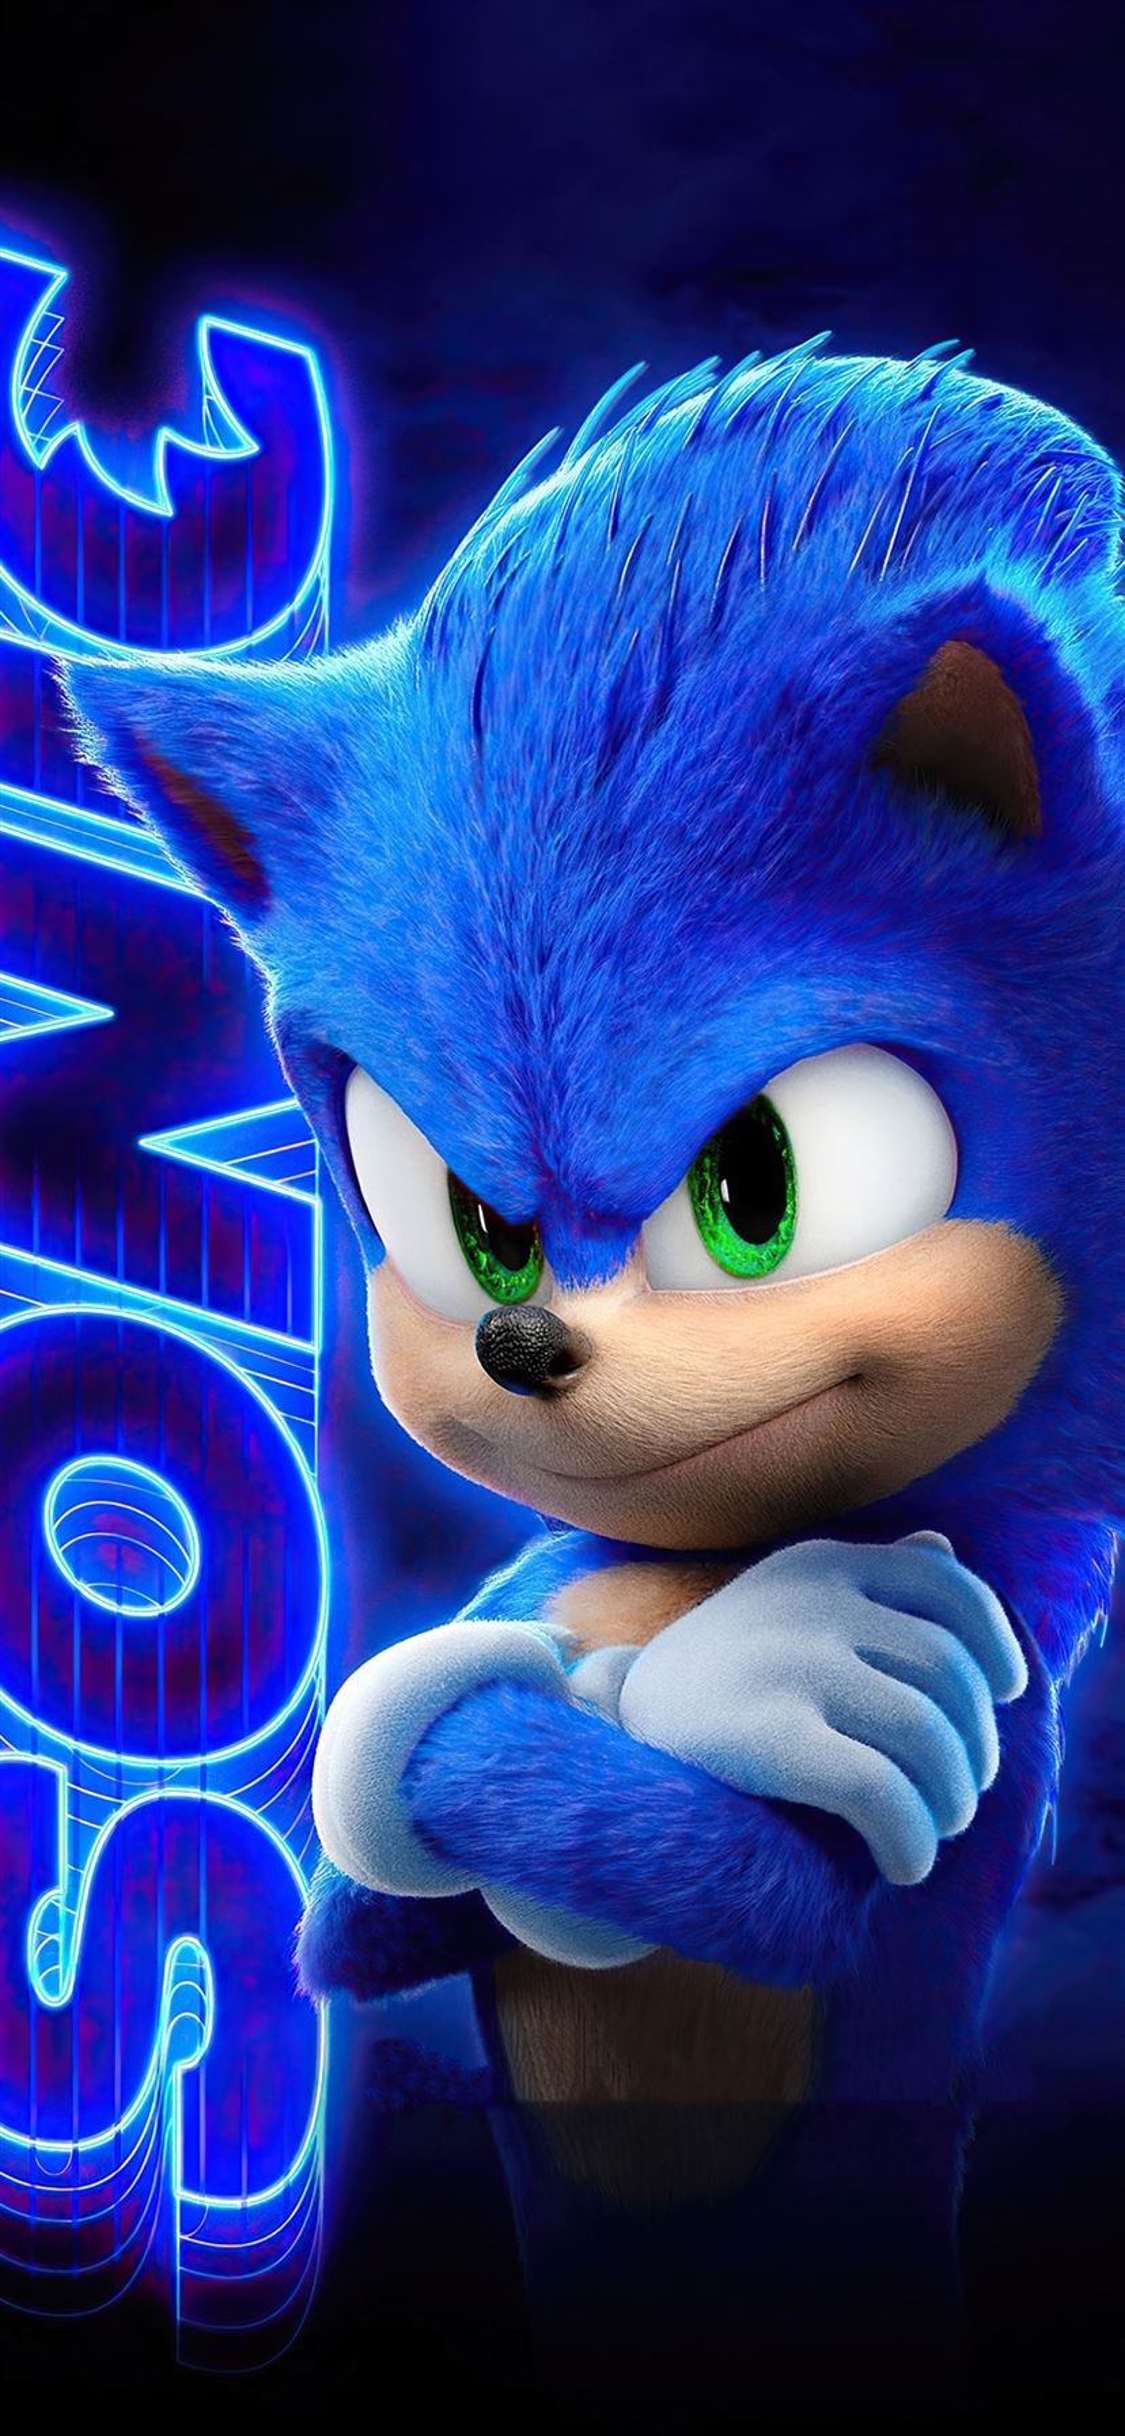 Best Sonic The Hedgehog Iphone 11 Wallpapers Hd Ilikewallpaper